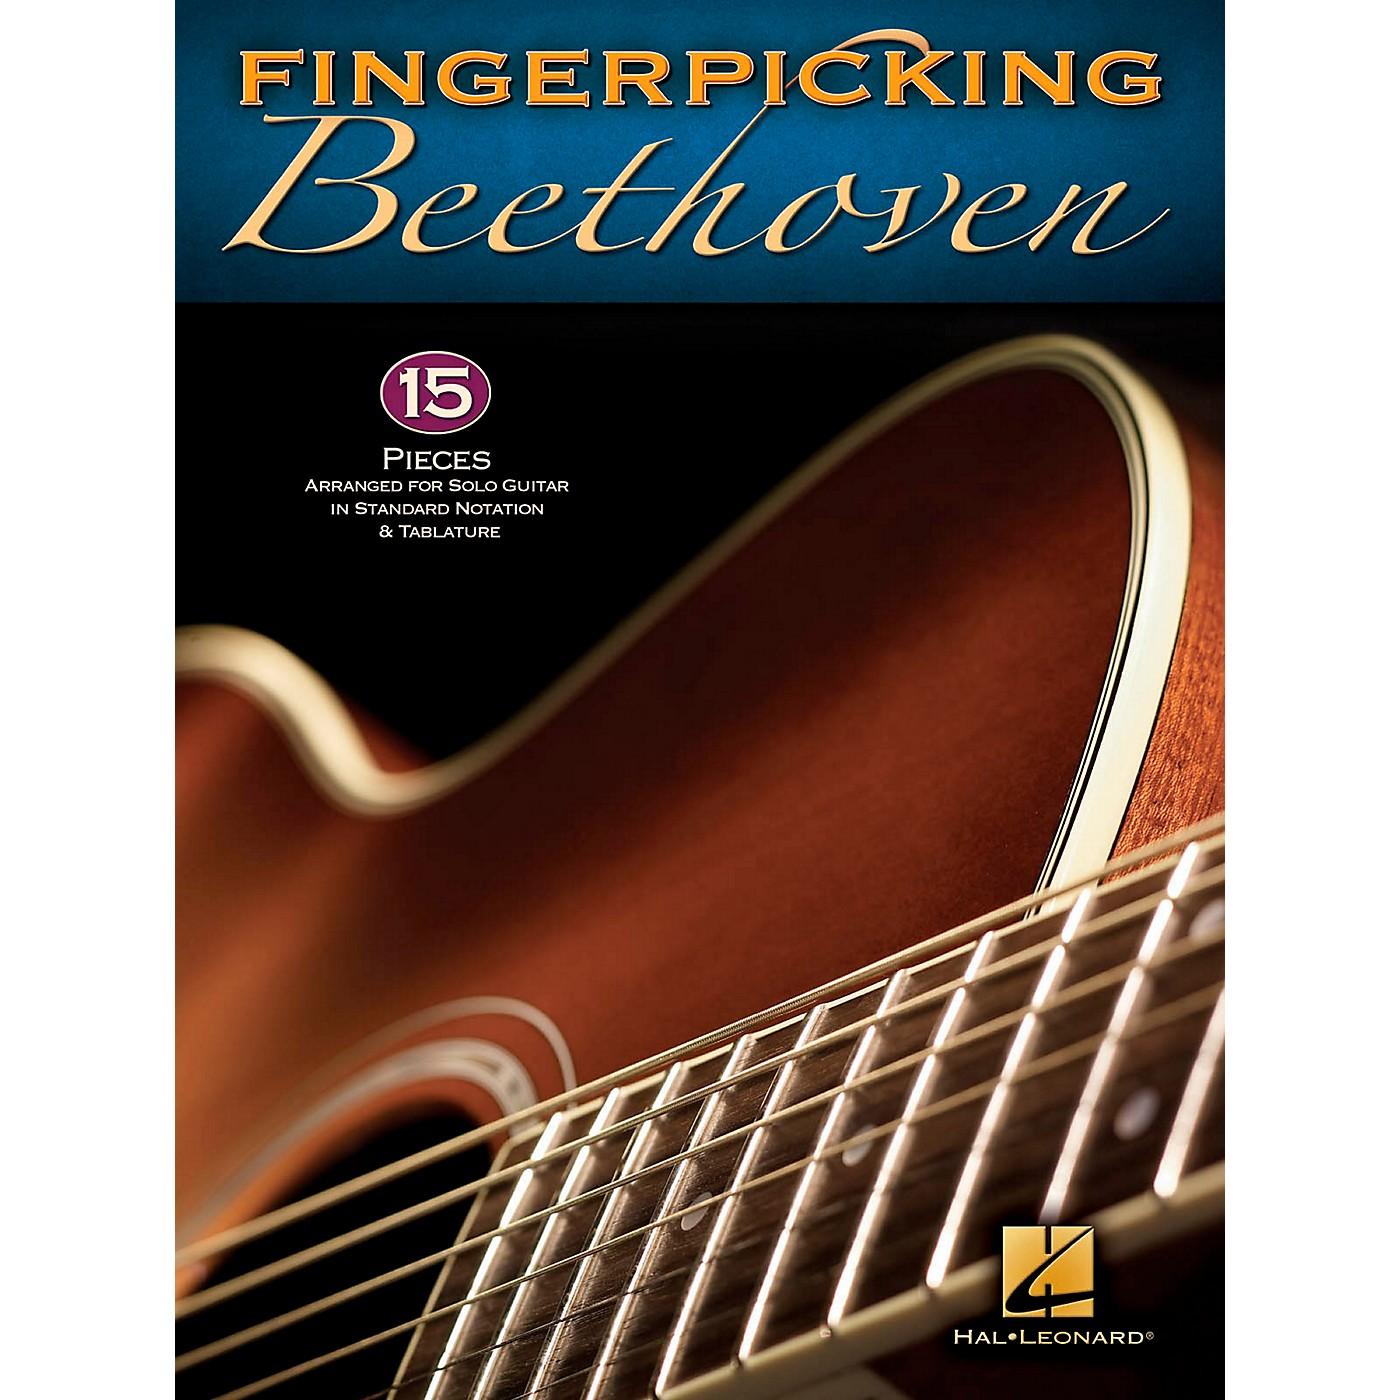 Hal Leonard Fingerpicking Beethoven for Solo Guitar - Standard Notation & Tab thumbnail